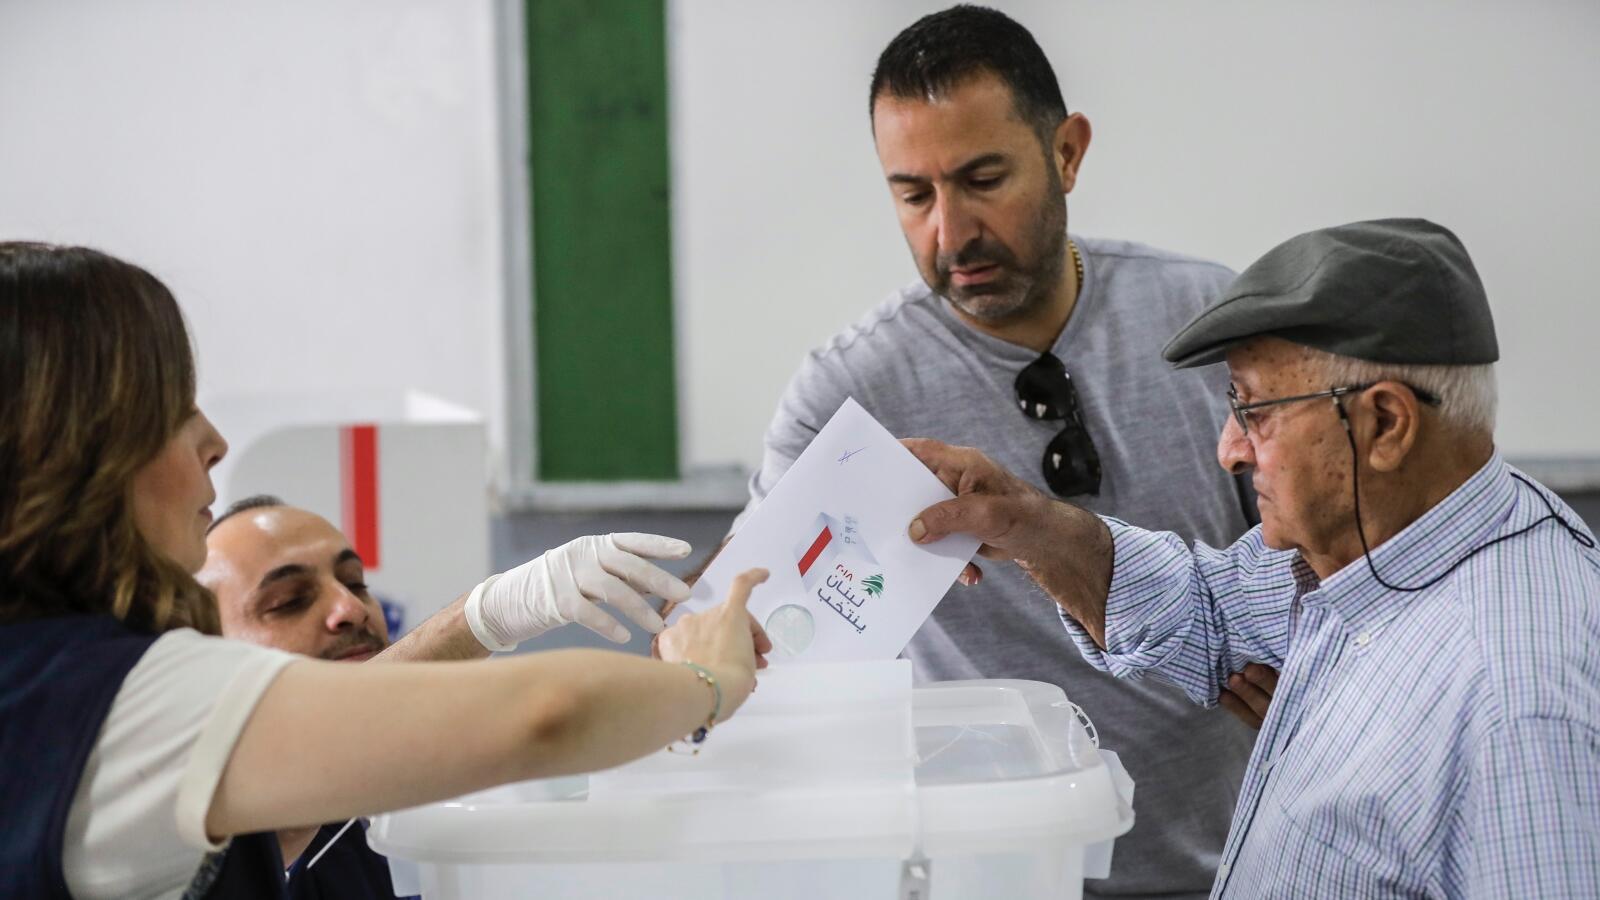 Lebanon Gelar Pemilu Parlemen Setelah Tertunda 9 Tahun